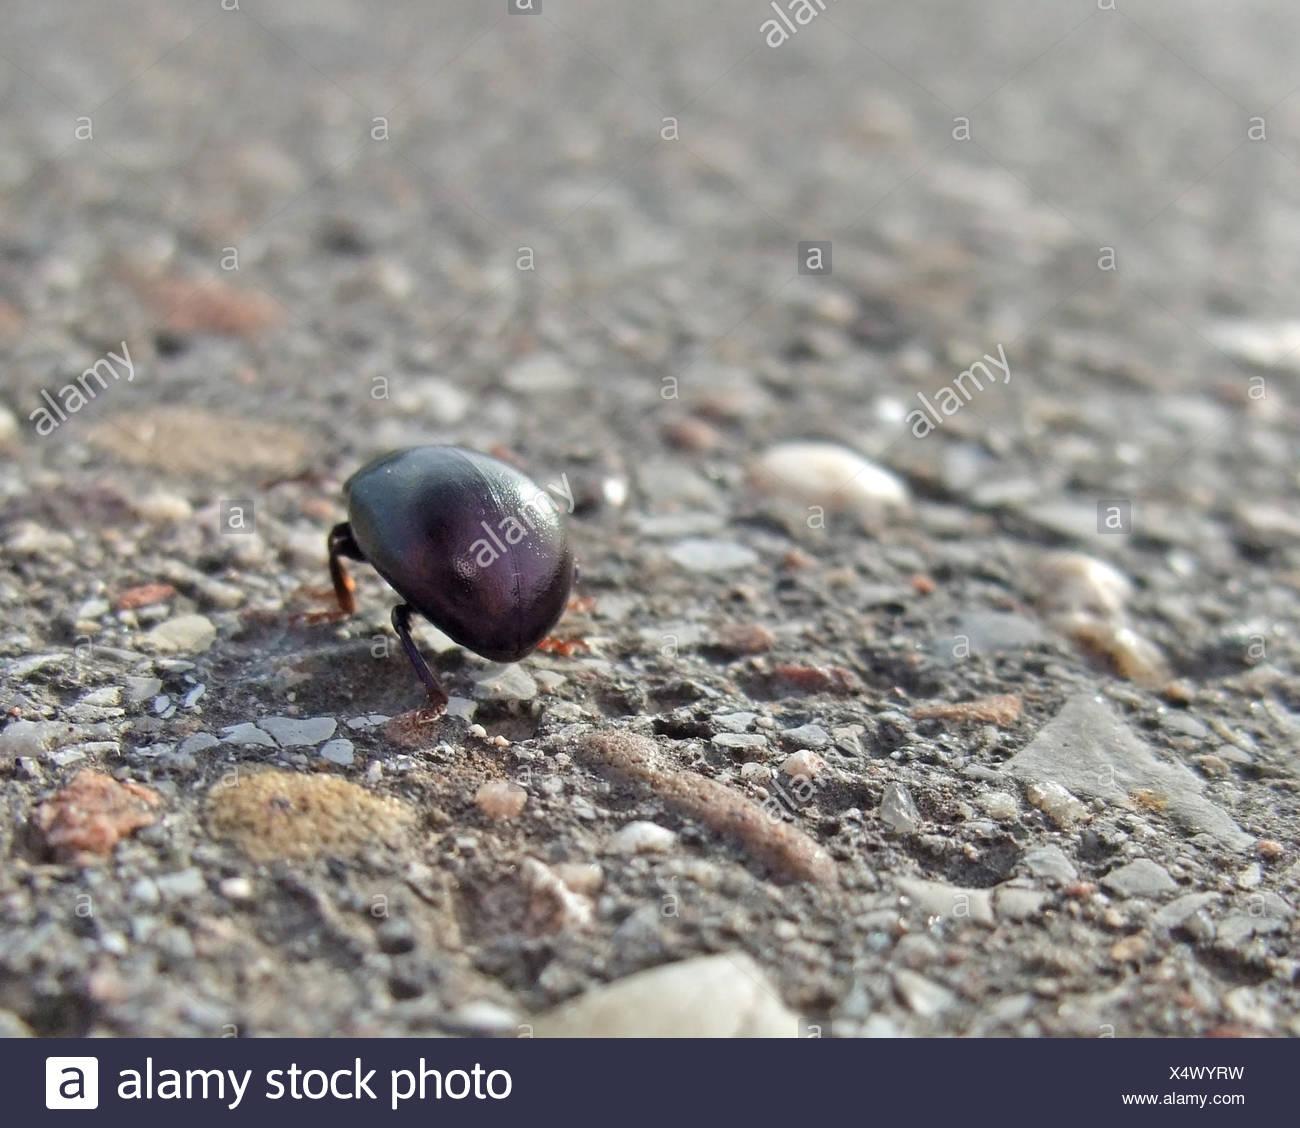 low angle closeup showing a bug named 'Cysolina sturmi' walking on pavement - Stock Image